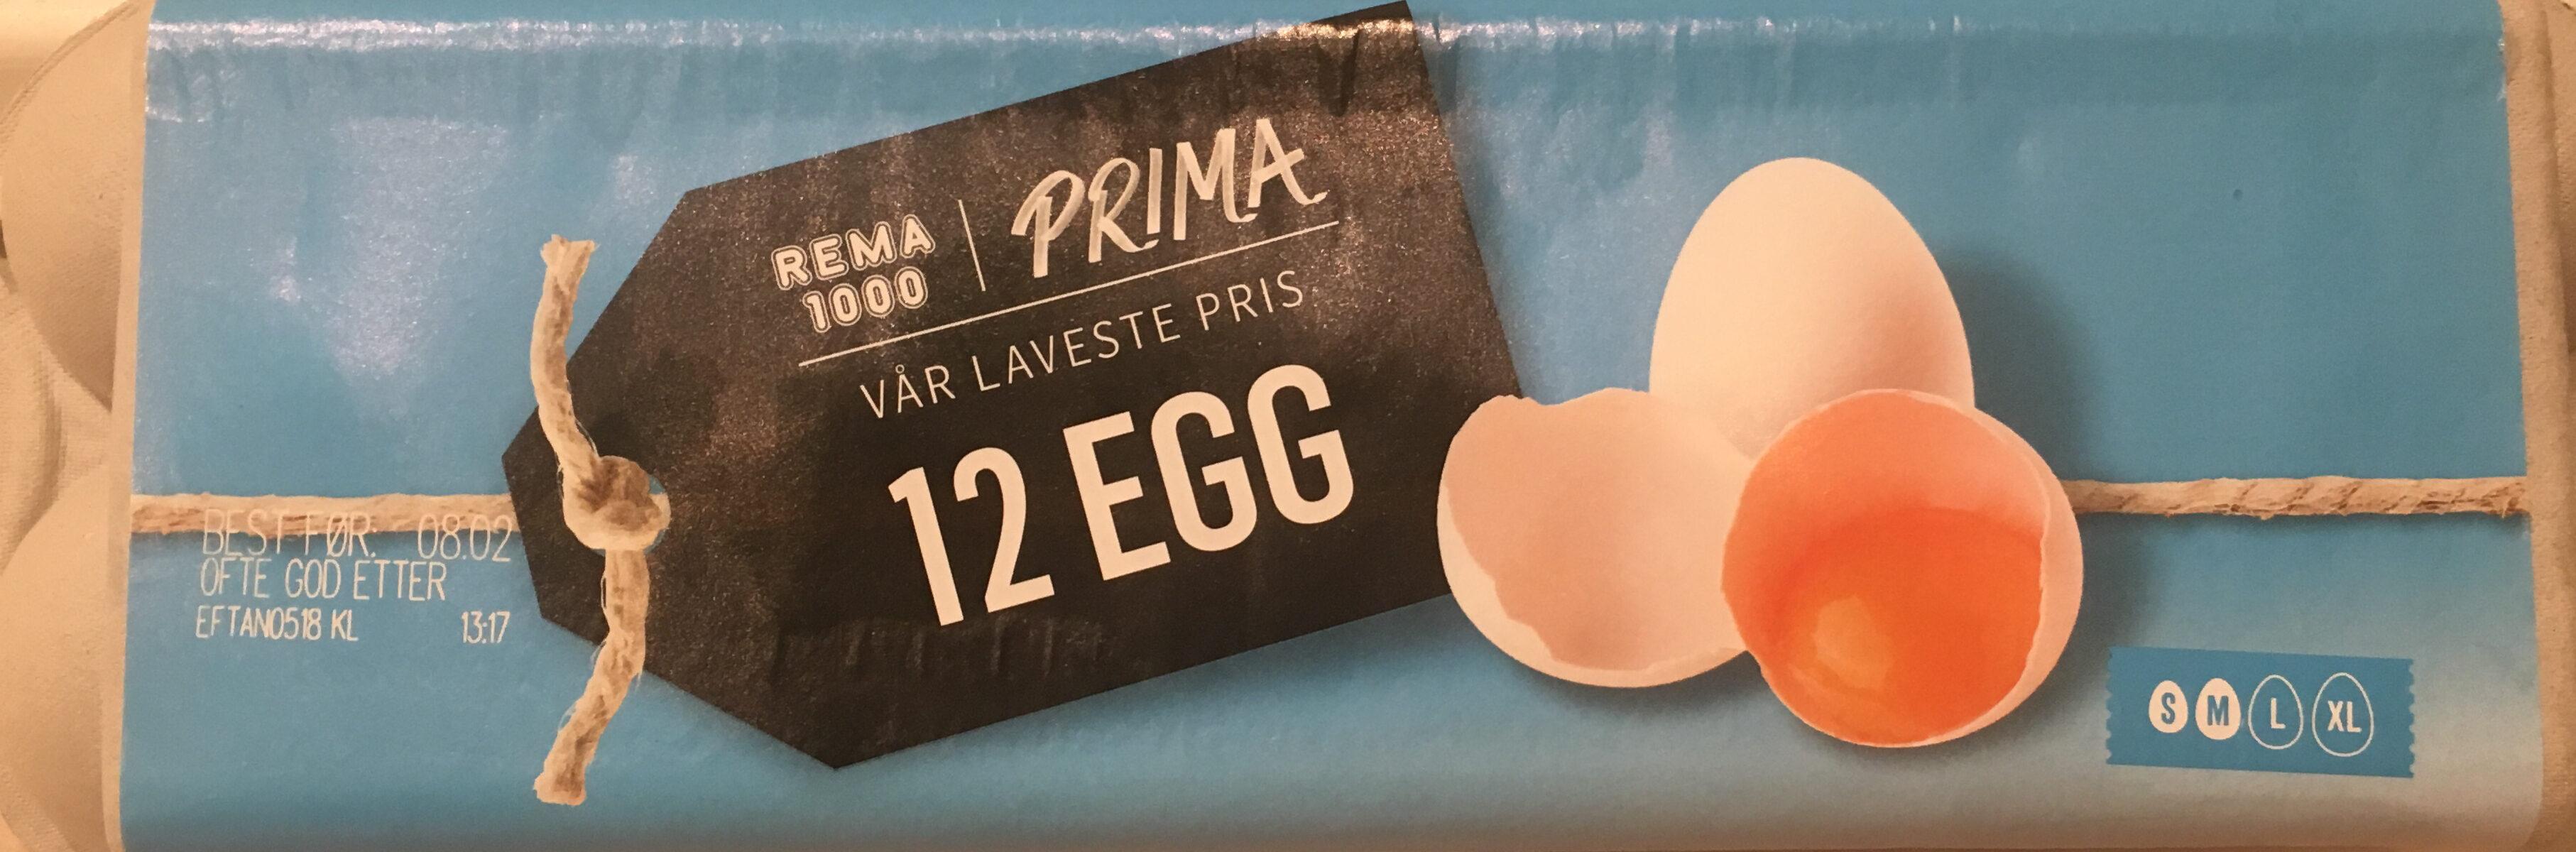 12 egg - Product - nb